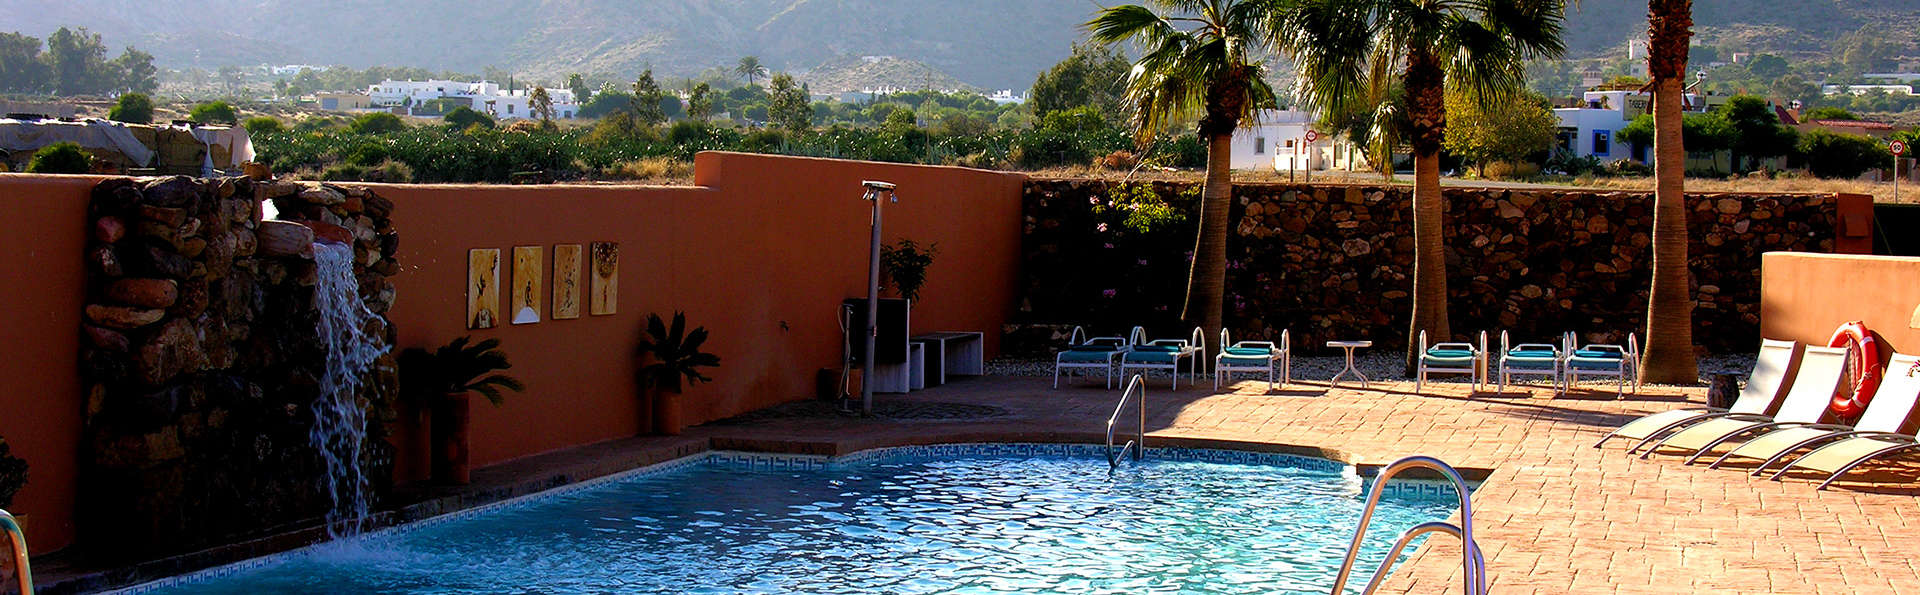 Hotel de Naturaleza Rodalquilar - edit_pool.jpg